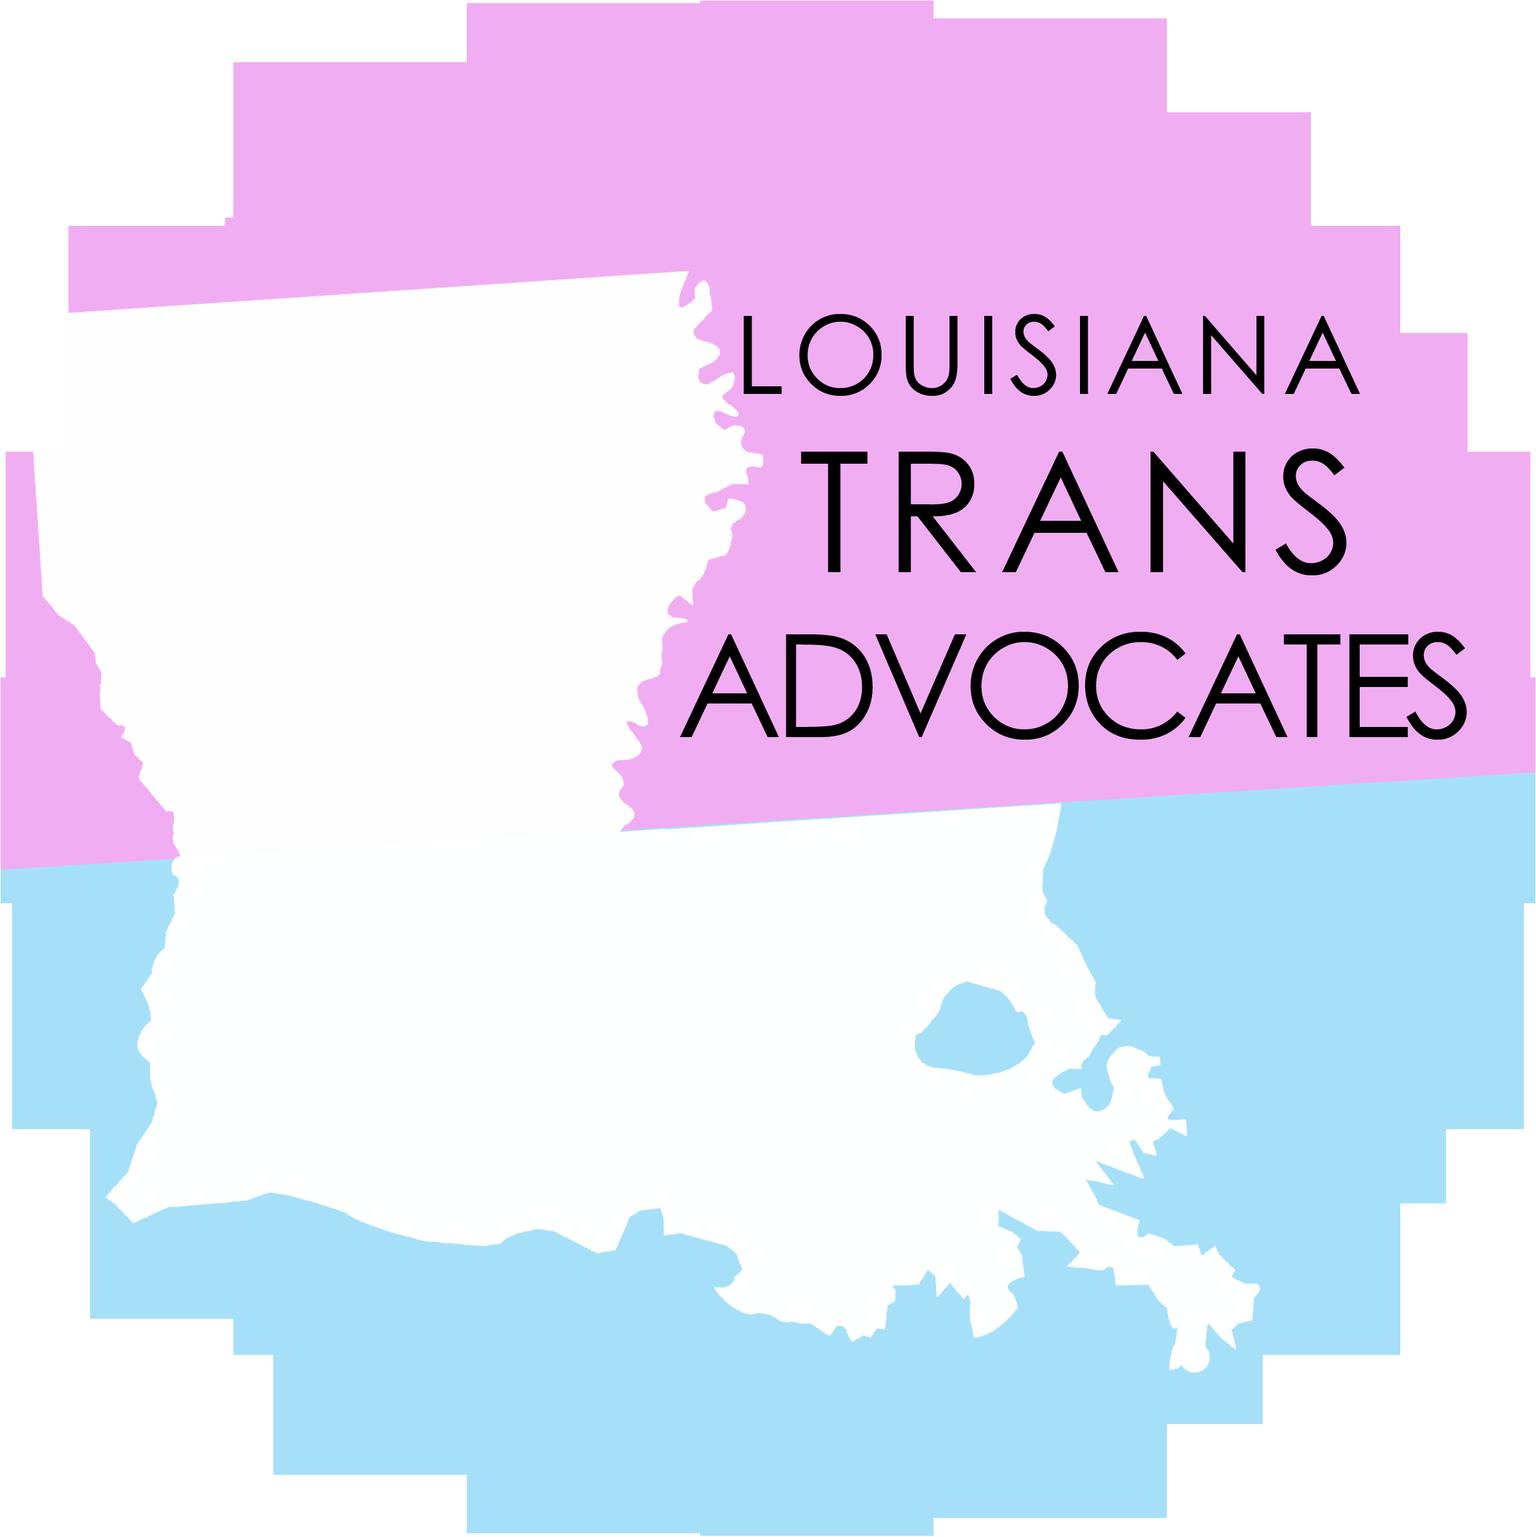 Louisiana trans advocates  - statewide